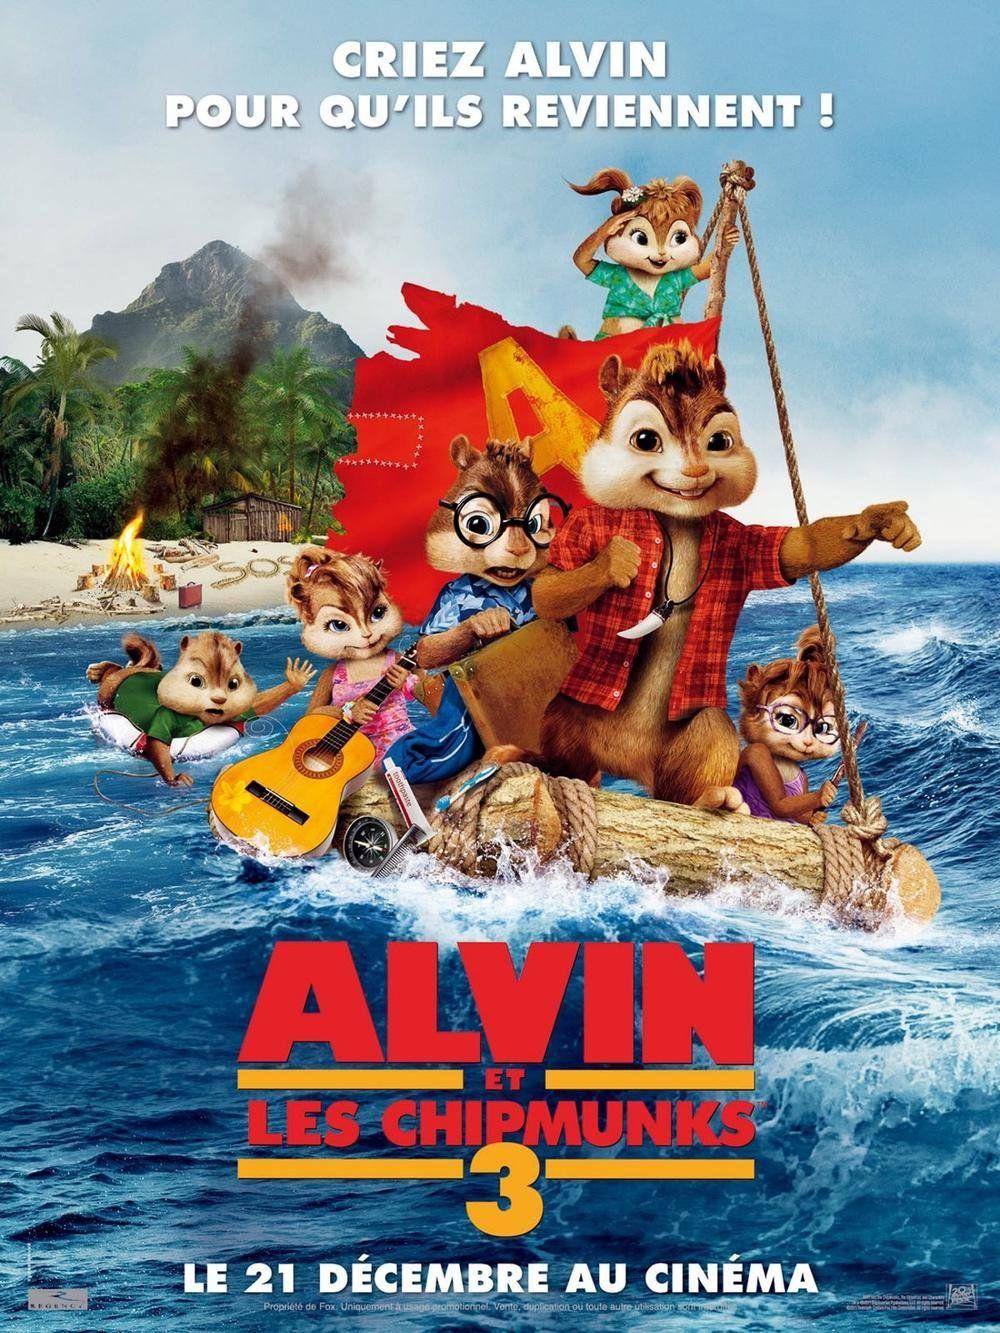 Alvin Et Les Chipmunks 3 Francia Dvd Les Alvin Chipmunks Dvd Alvin And The Chipmunks Alvin And Chipmunks Movie Chipmunks